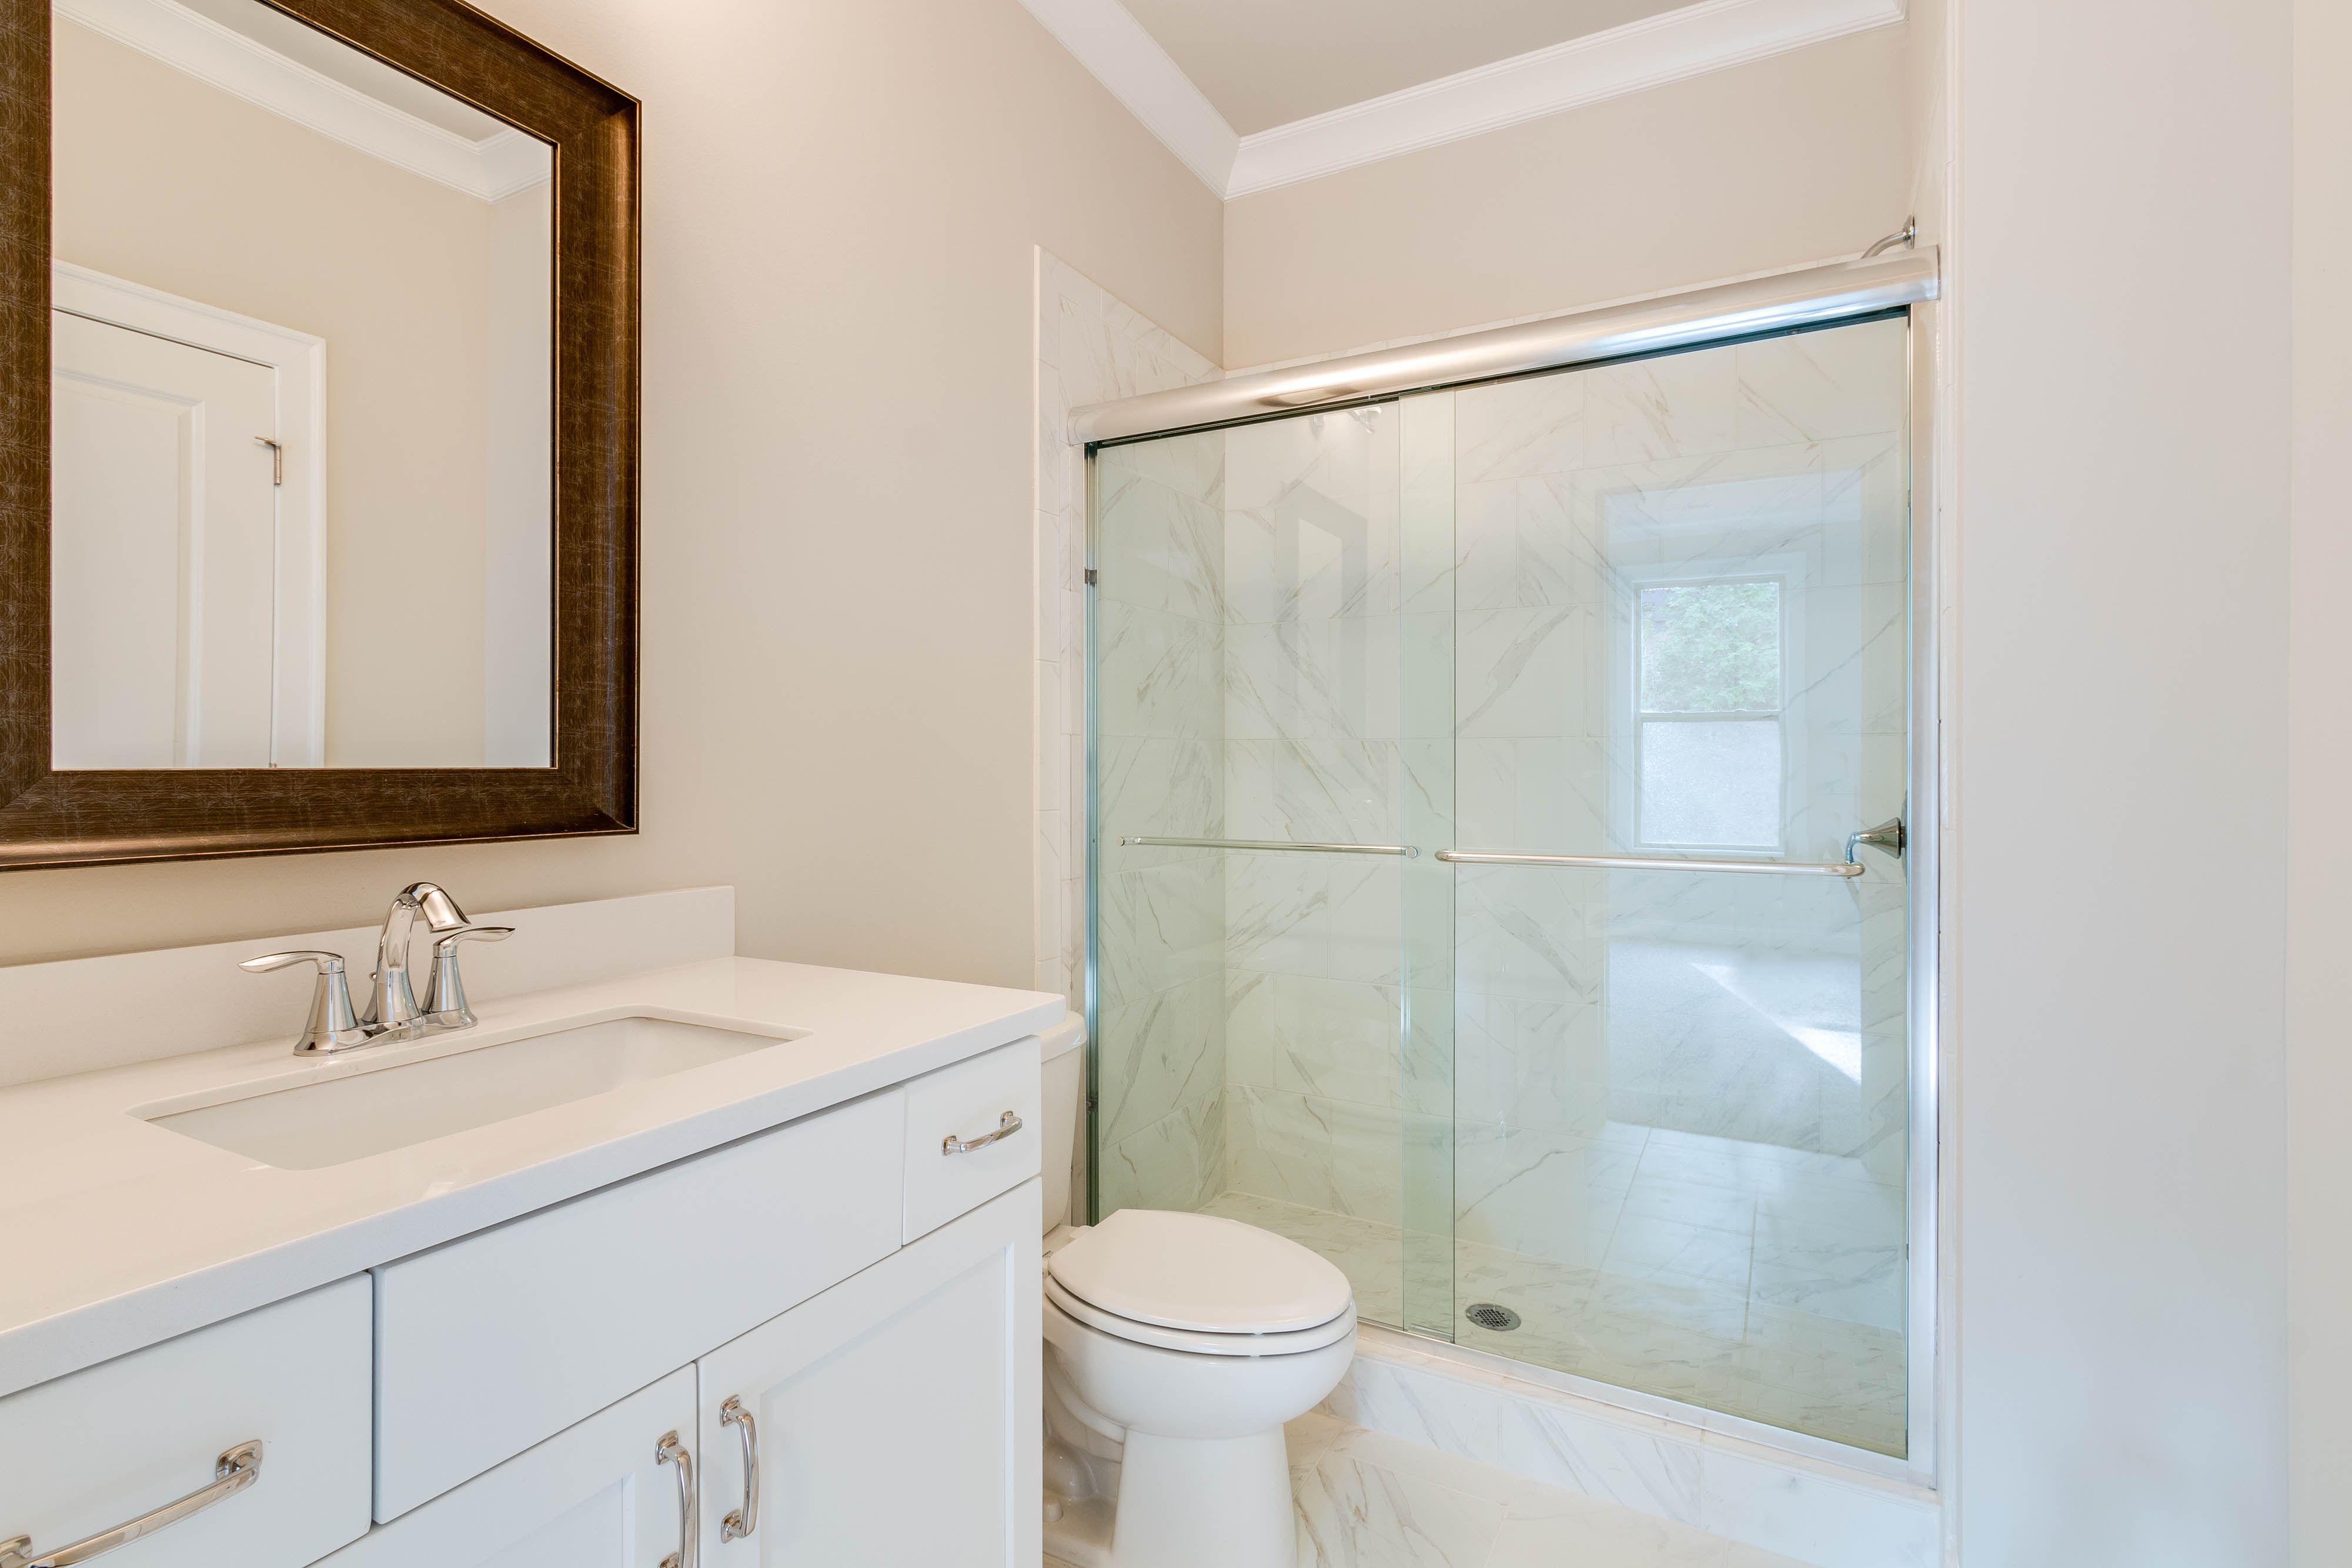 This Calhoun Bath Features The Piedrafina Glacier White Marble Top And Floine Carrara Shower Wall Tile